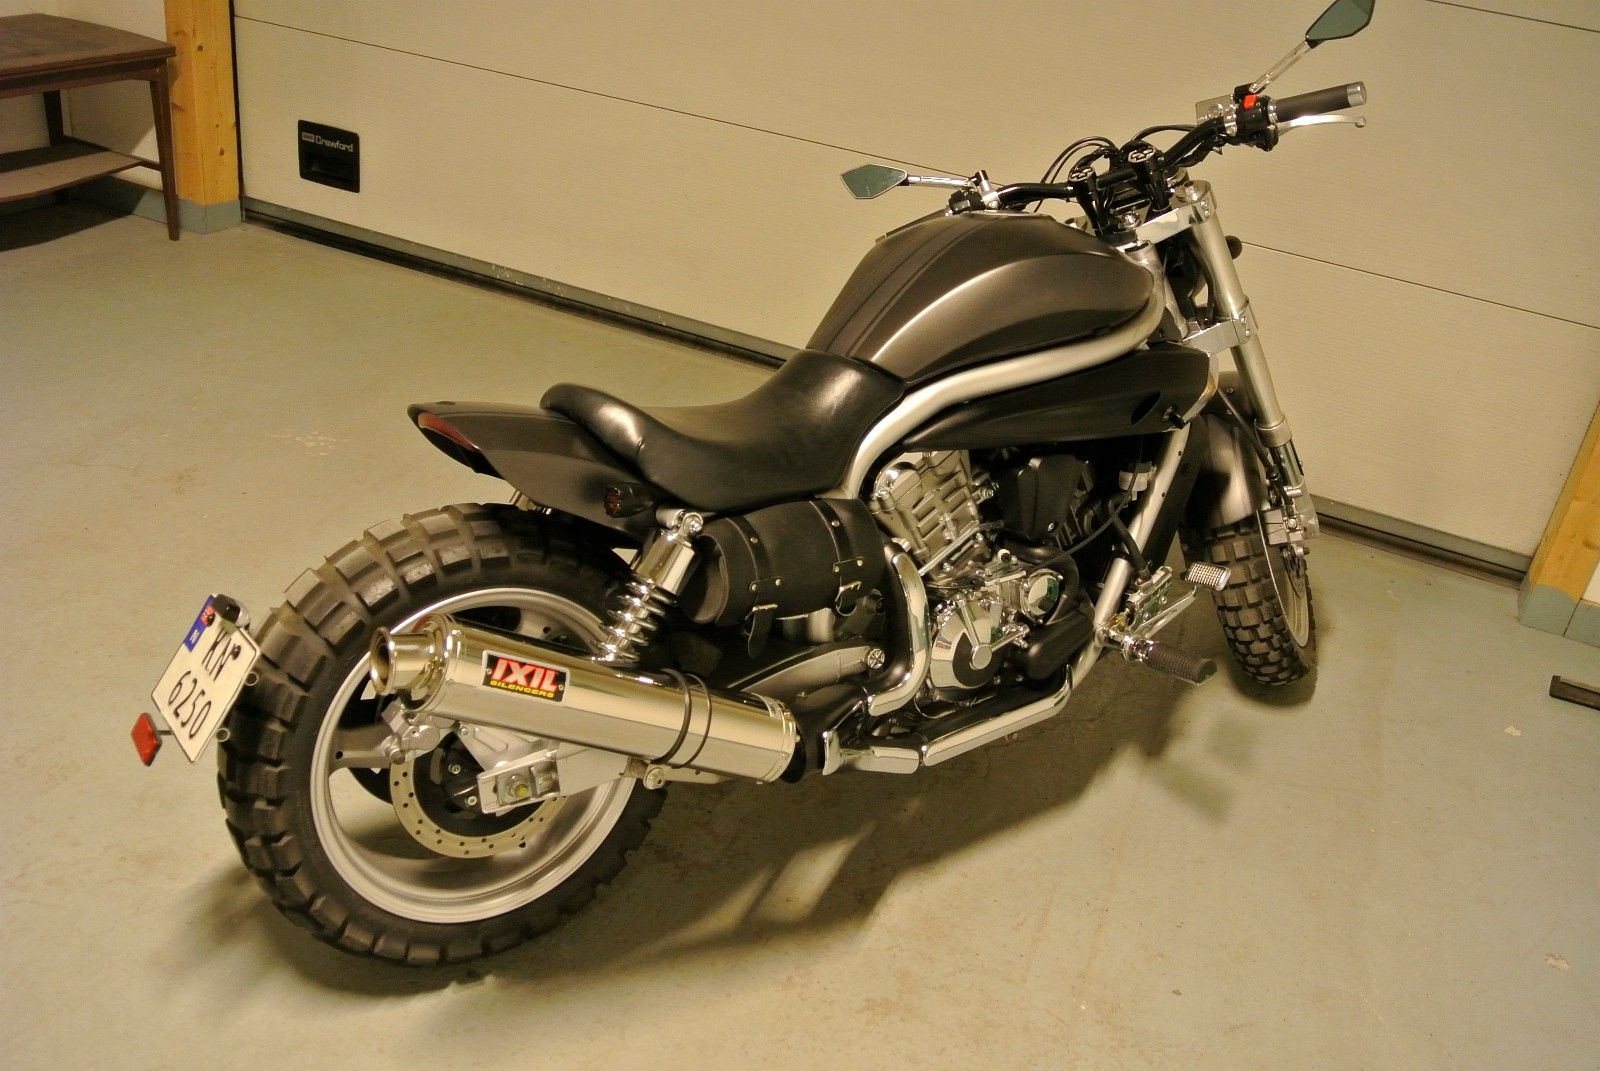 FINN – Hyosung AQUILA GV 650 Cars And Motorcycles, Bullet, Motorcycles,  Motorbikes,